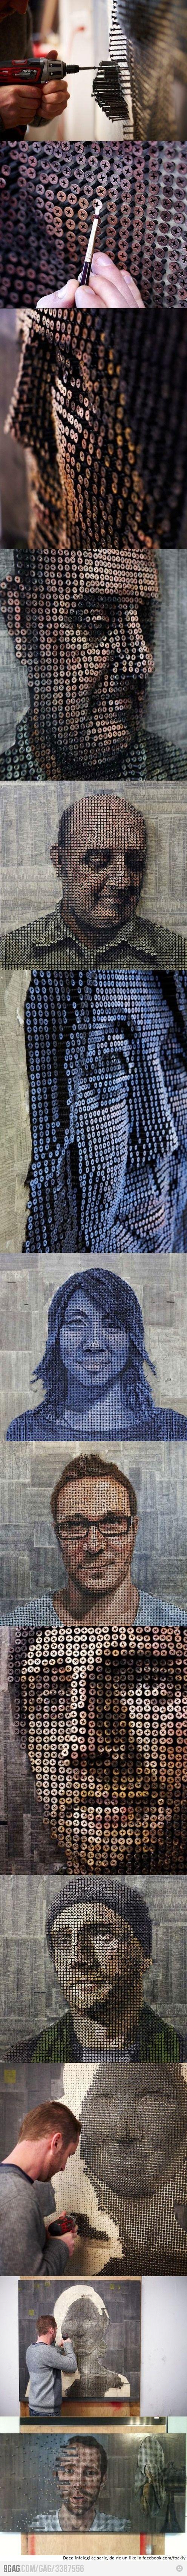 portraiture, via screws by Andrew Meyers